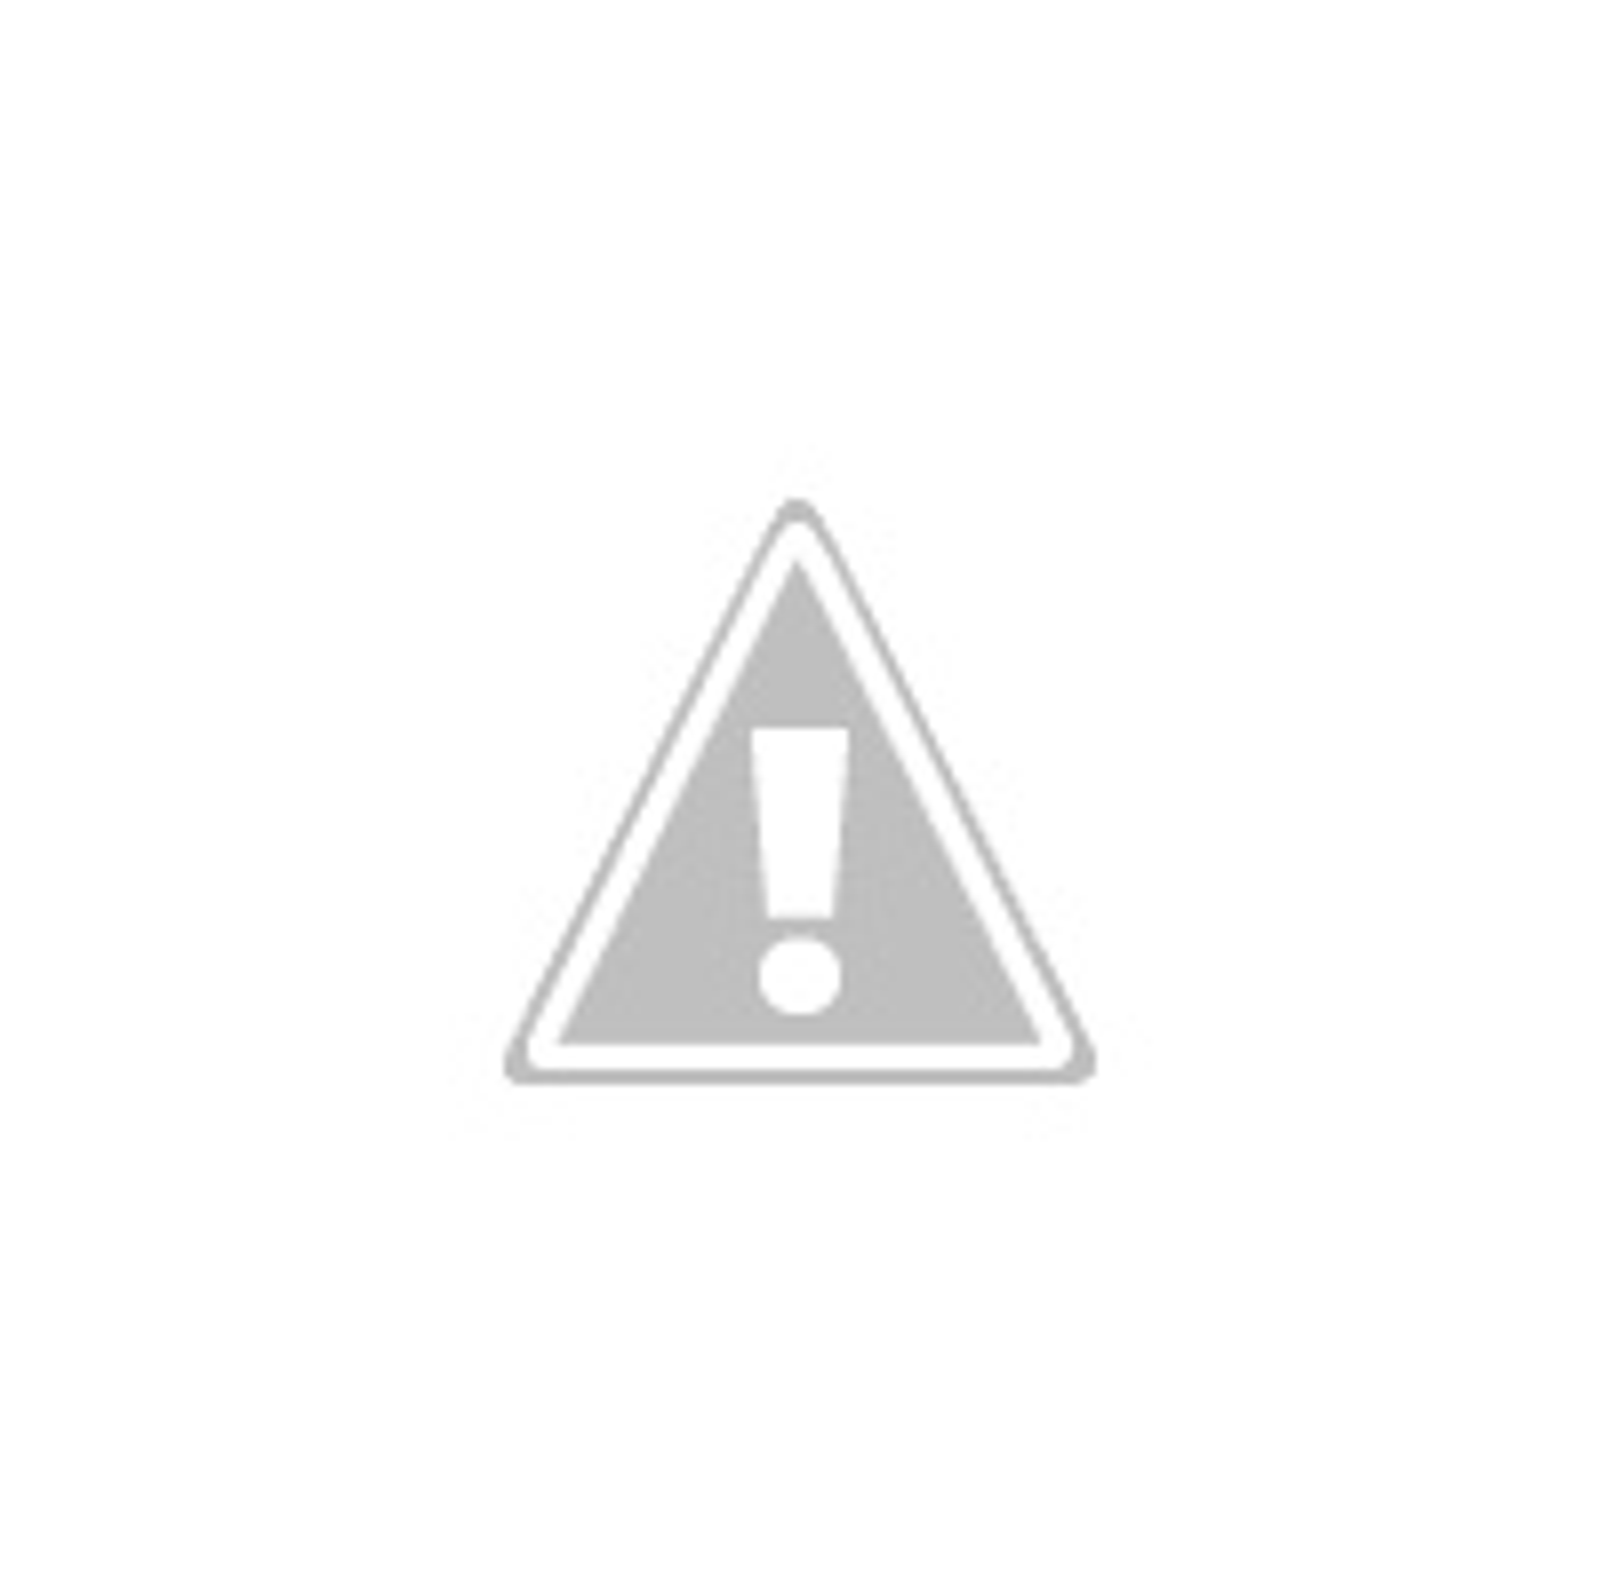 COMO PREPARAR GOMITAS DE FRESA EN FORMA DE CORAZÓN - POSTRES DE SAN VALENTIN recipes